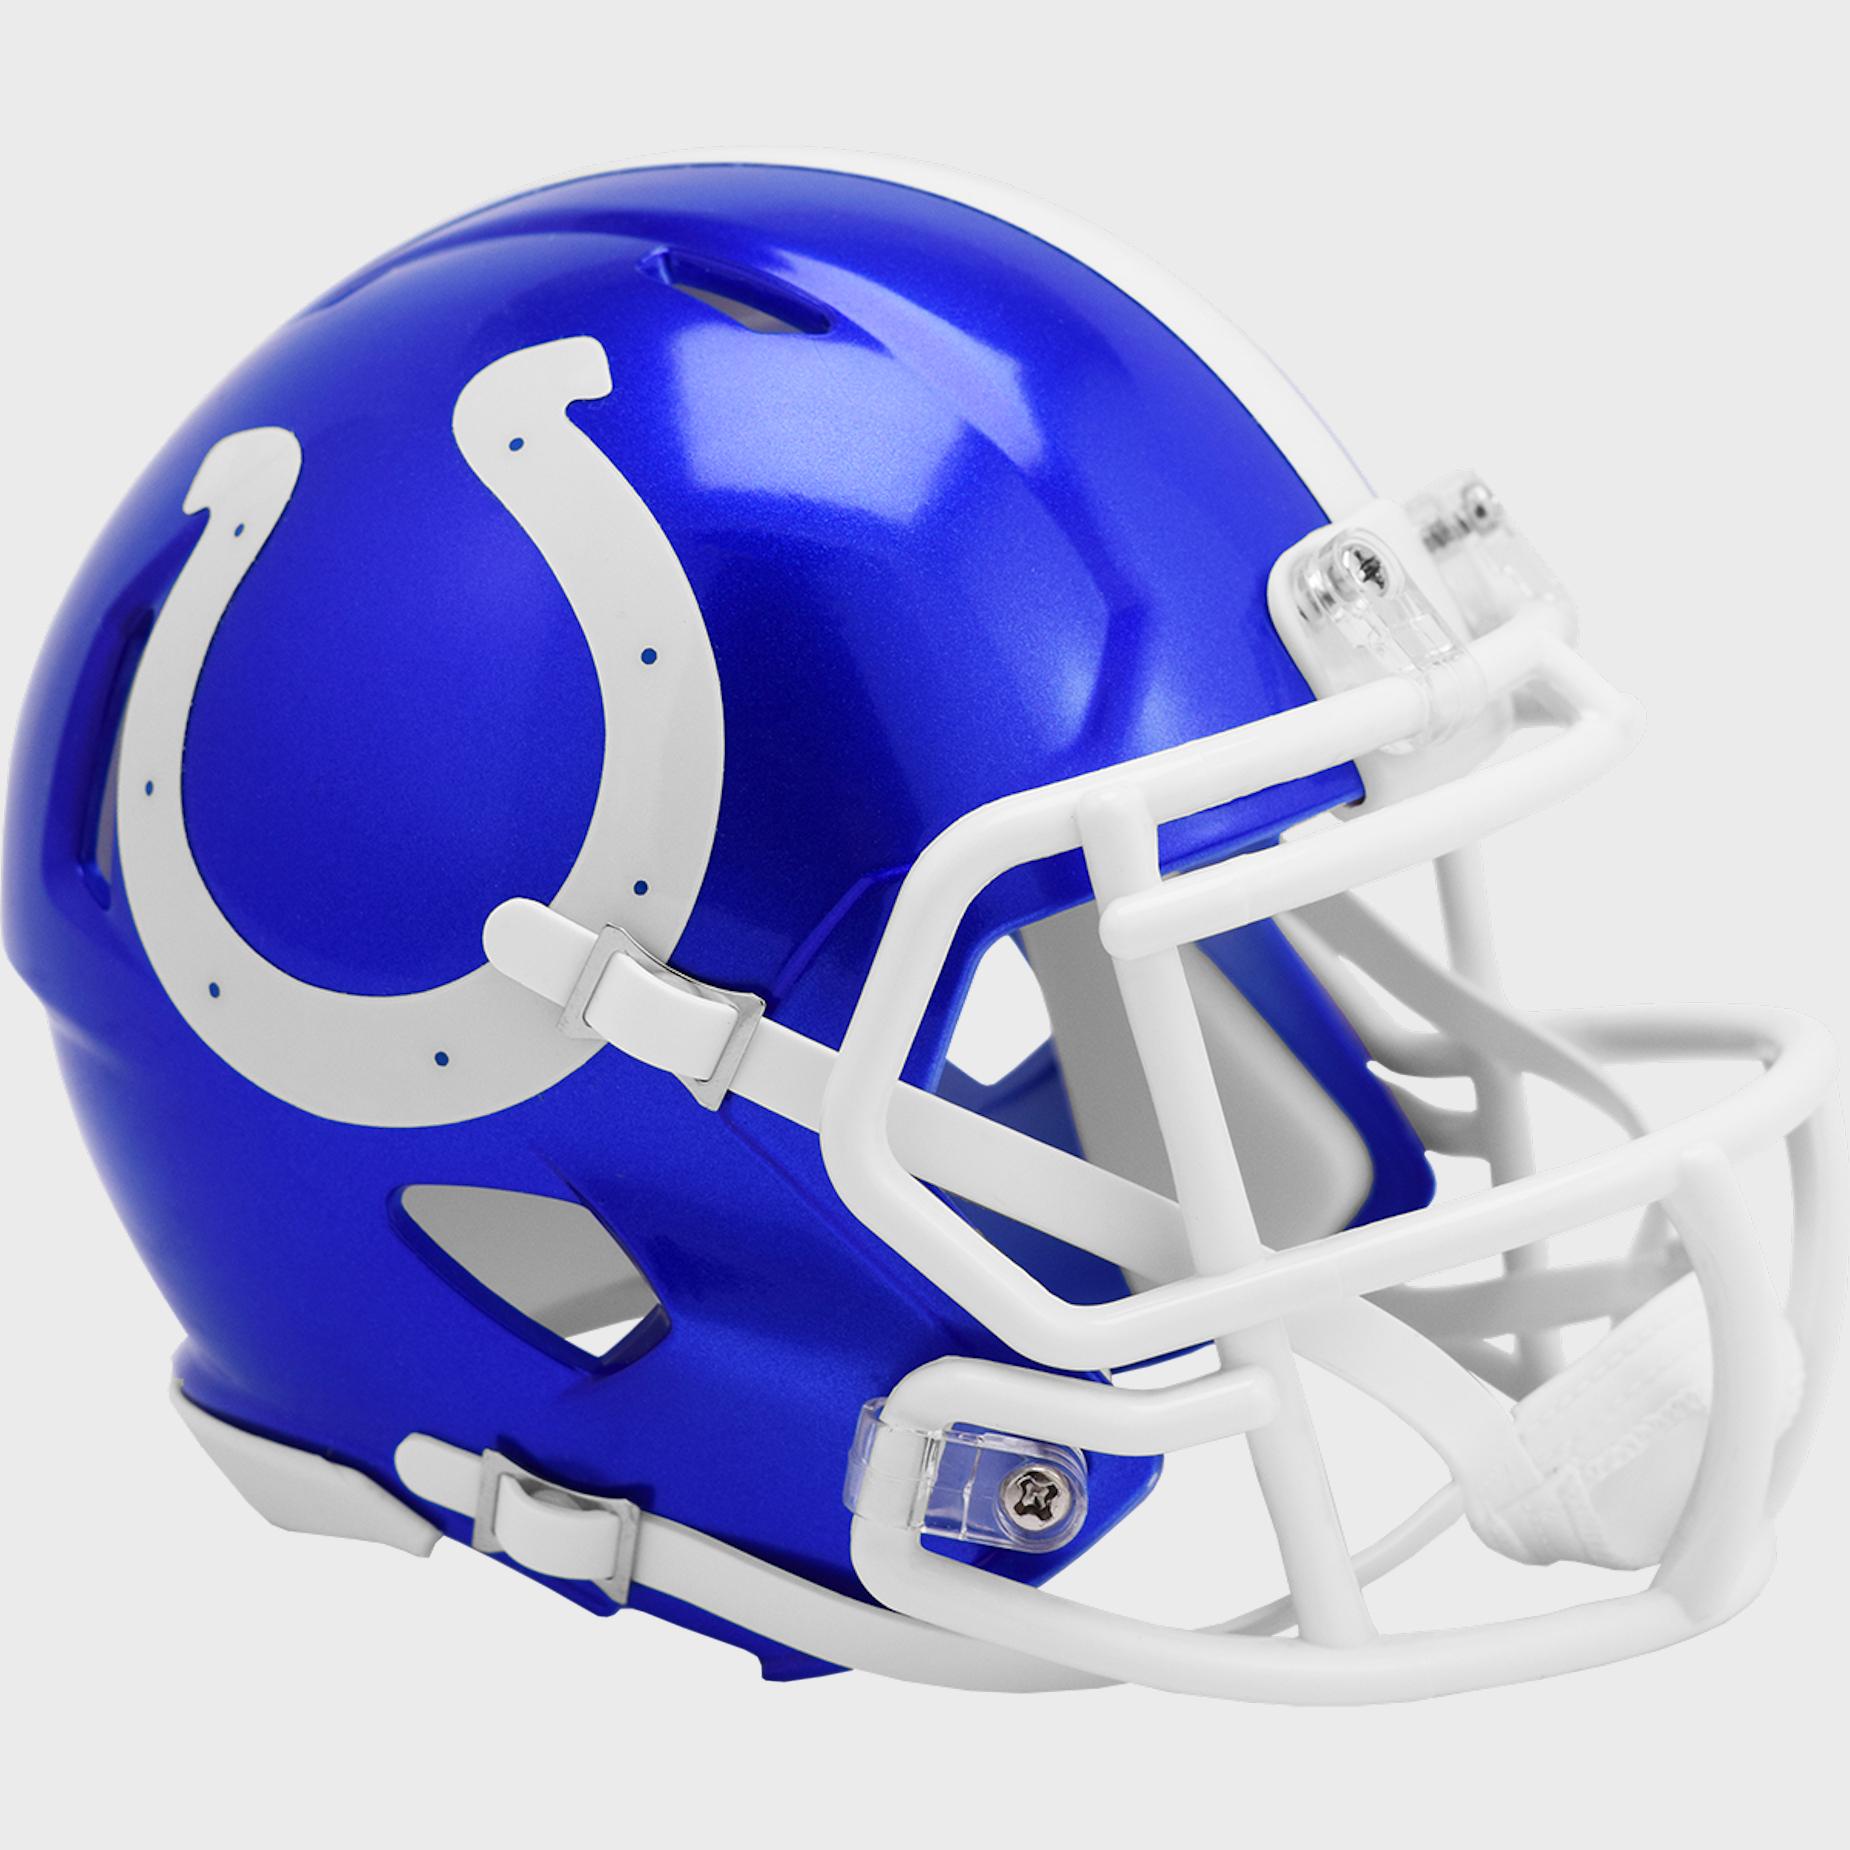 Indianapolis Colts Speed Mini Football Helmet <B>FLASH ESD 8/21/21</B>